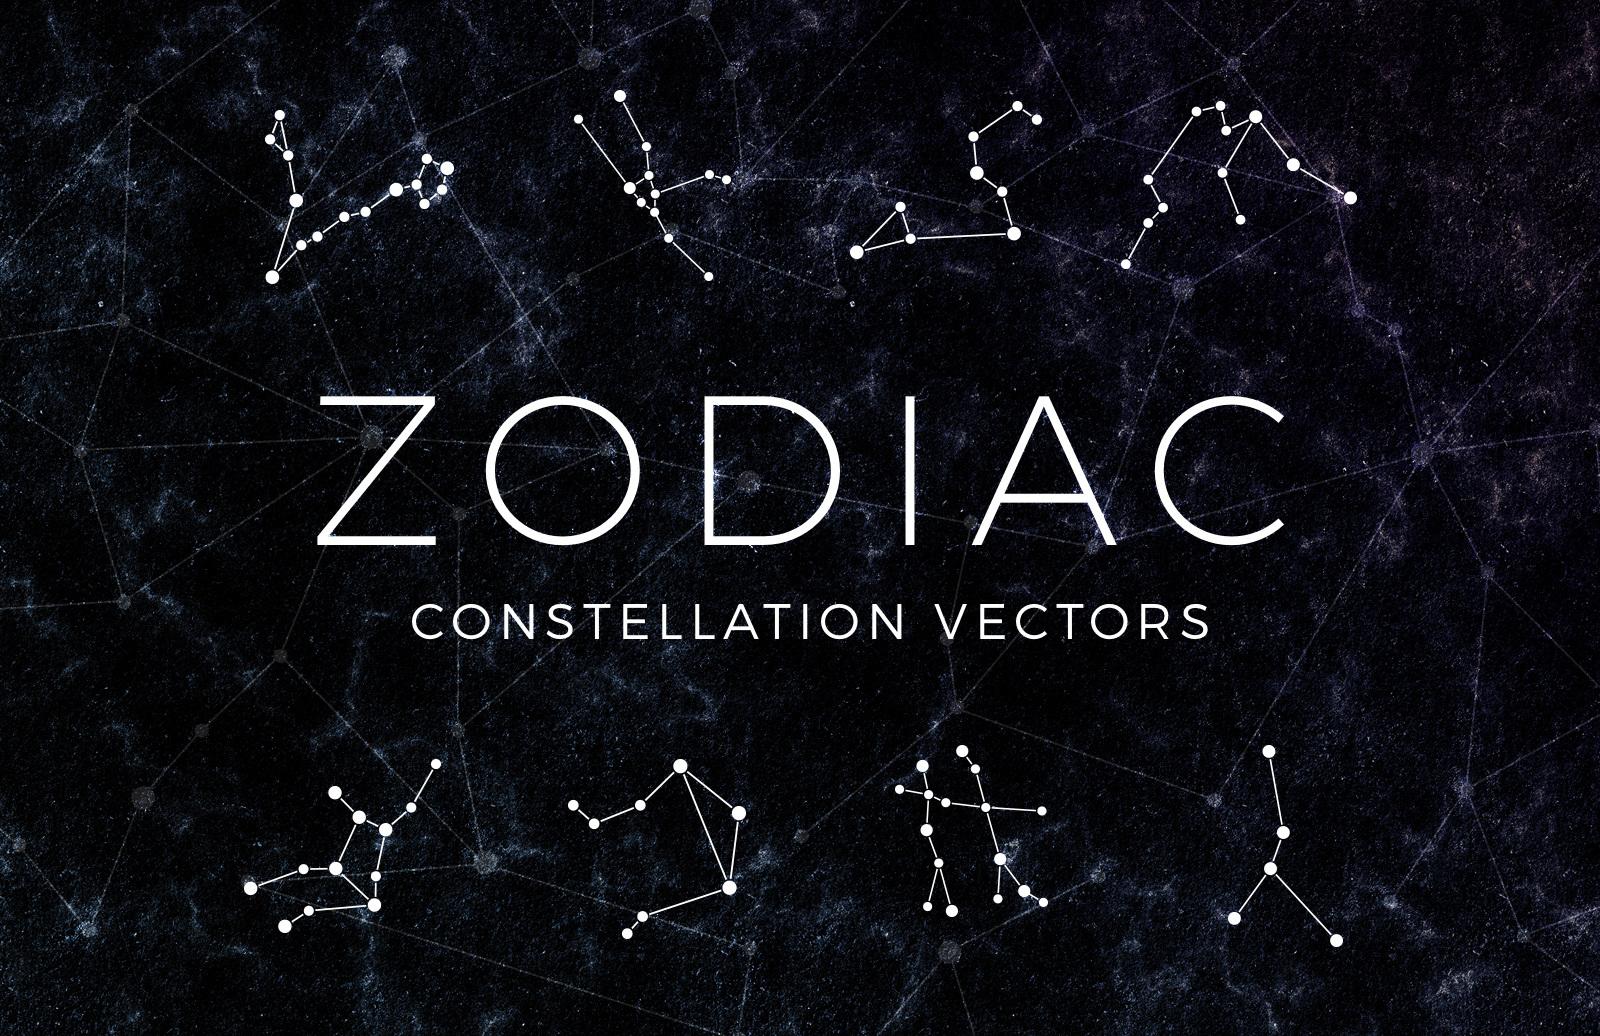 Zodiac Constellation Vectors Preview 1